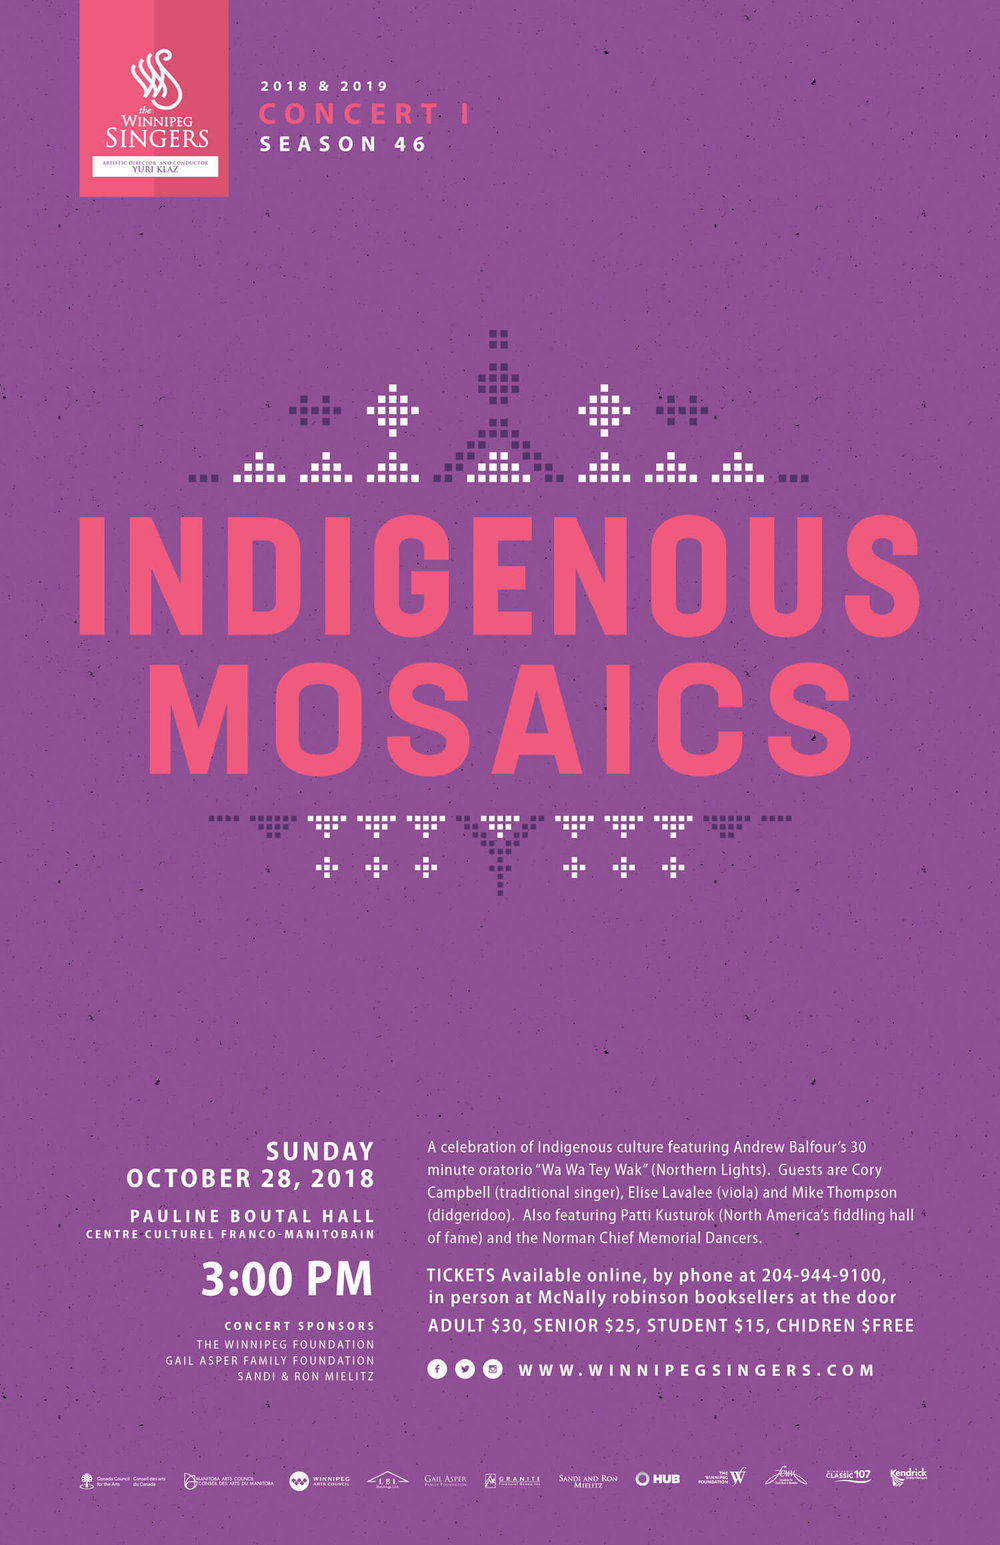 Winnipeg Singers - Indigenous Mosaics Concert